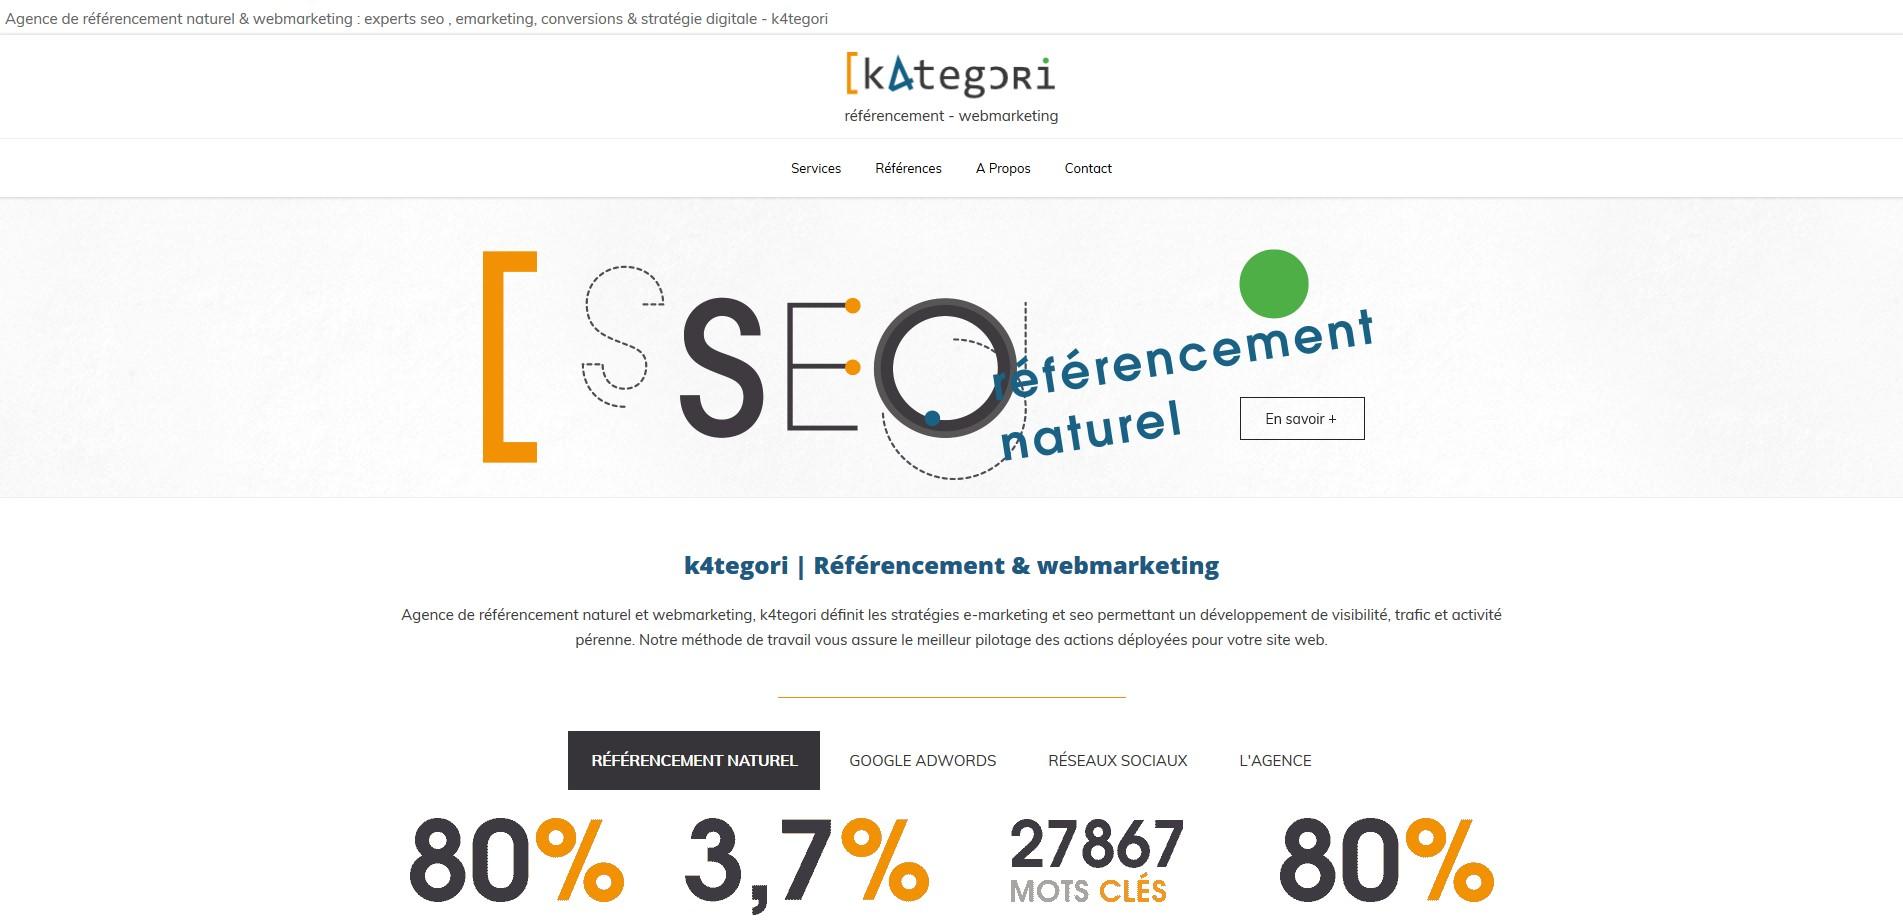 k4tegori-agence-de-referencement